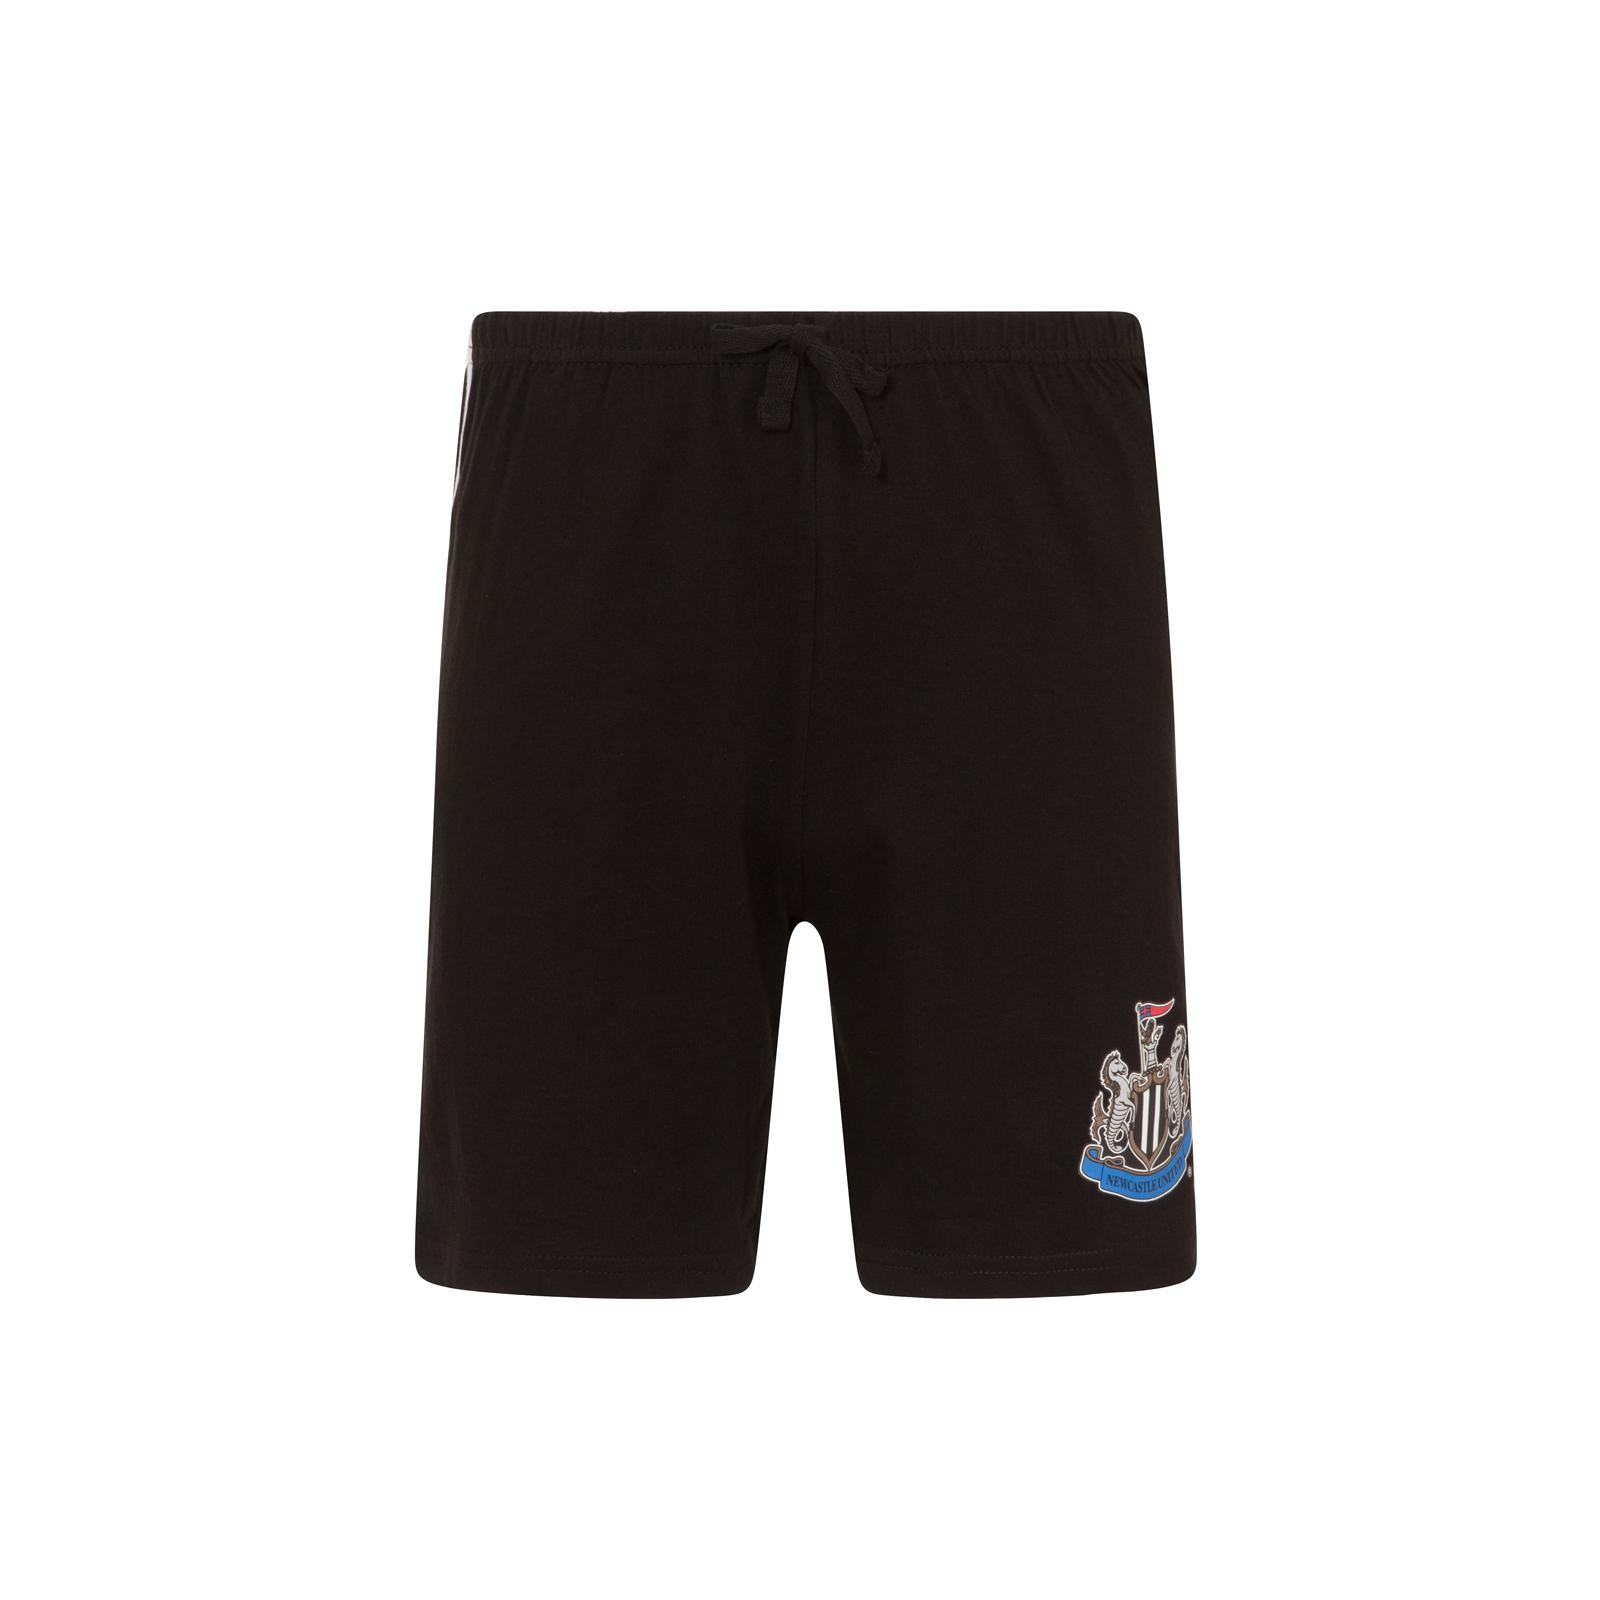 Offizielles Merchandise Herren Schlafanzug-Shorty Newcastle United FC